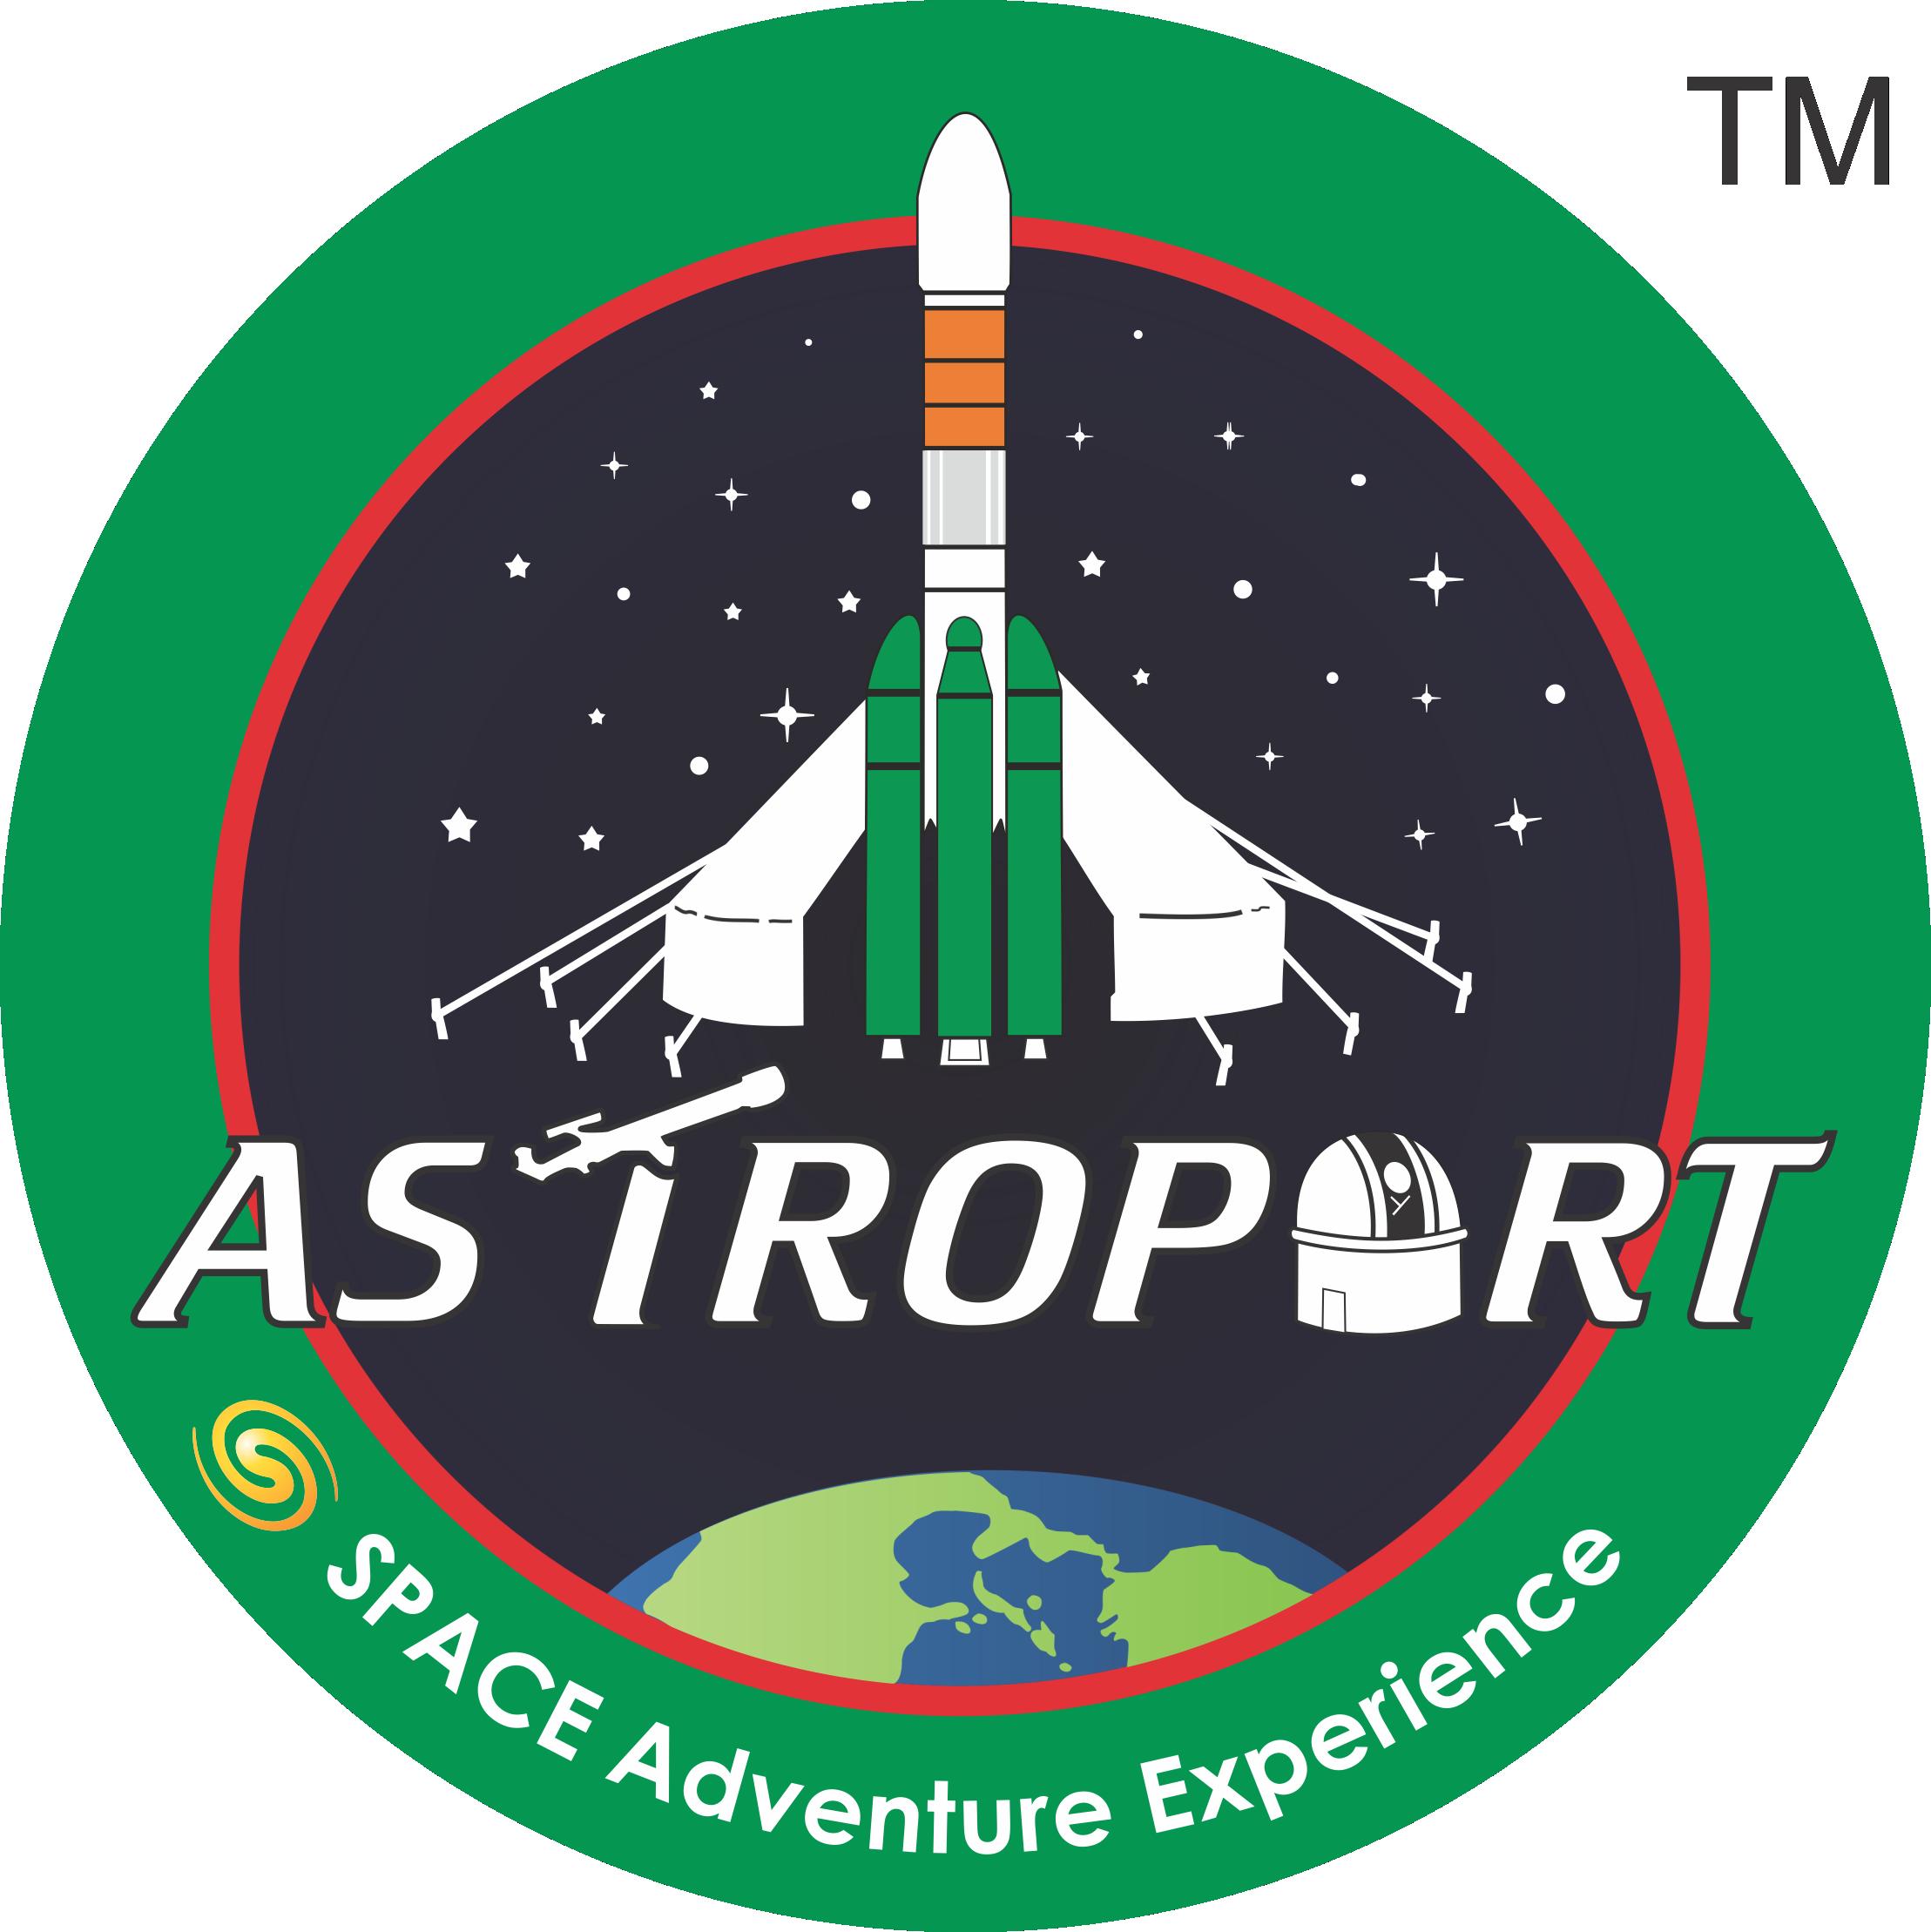 Astroport, Space Adventure Program